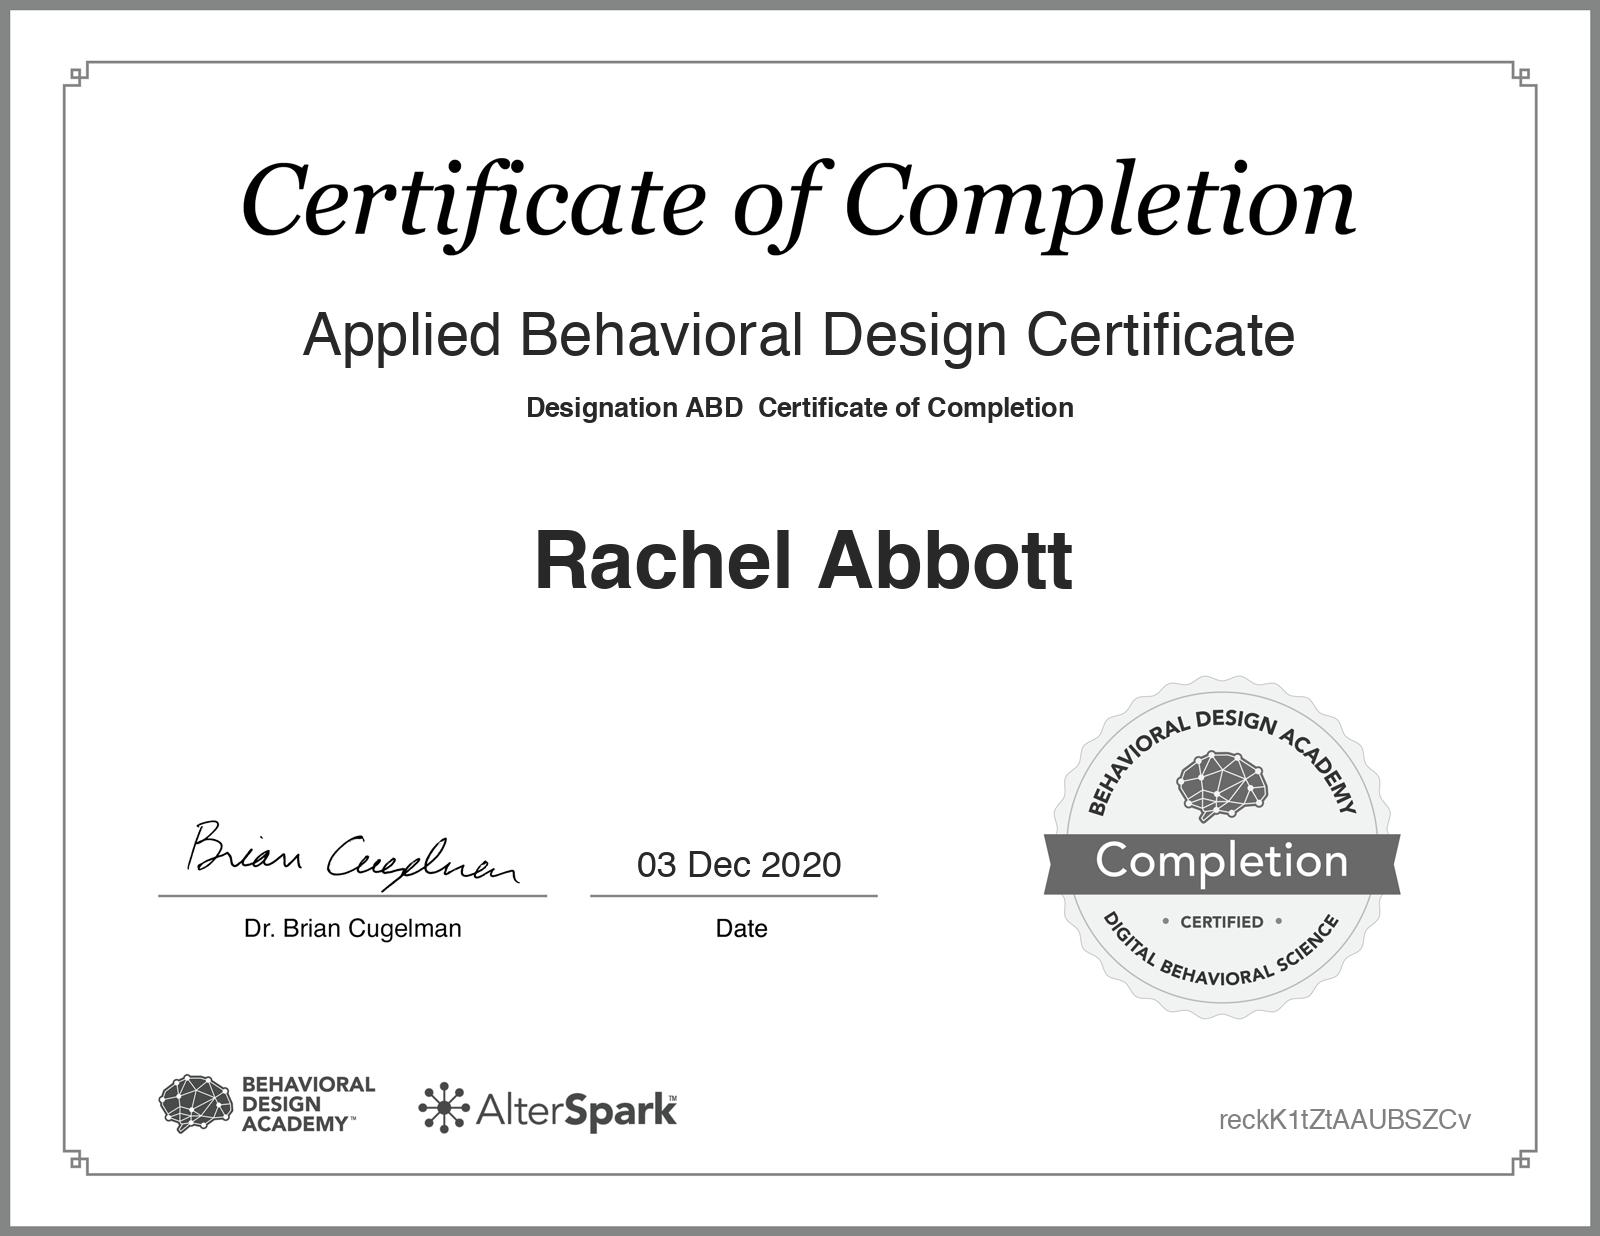 Applied Behavioral Design Certificate